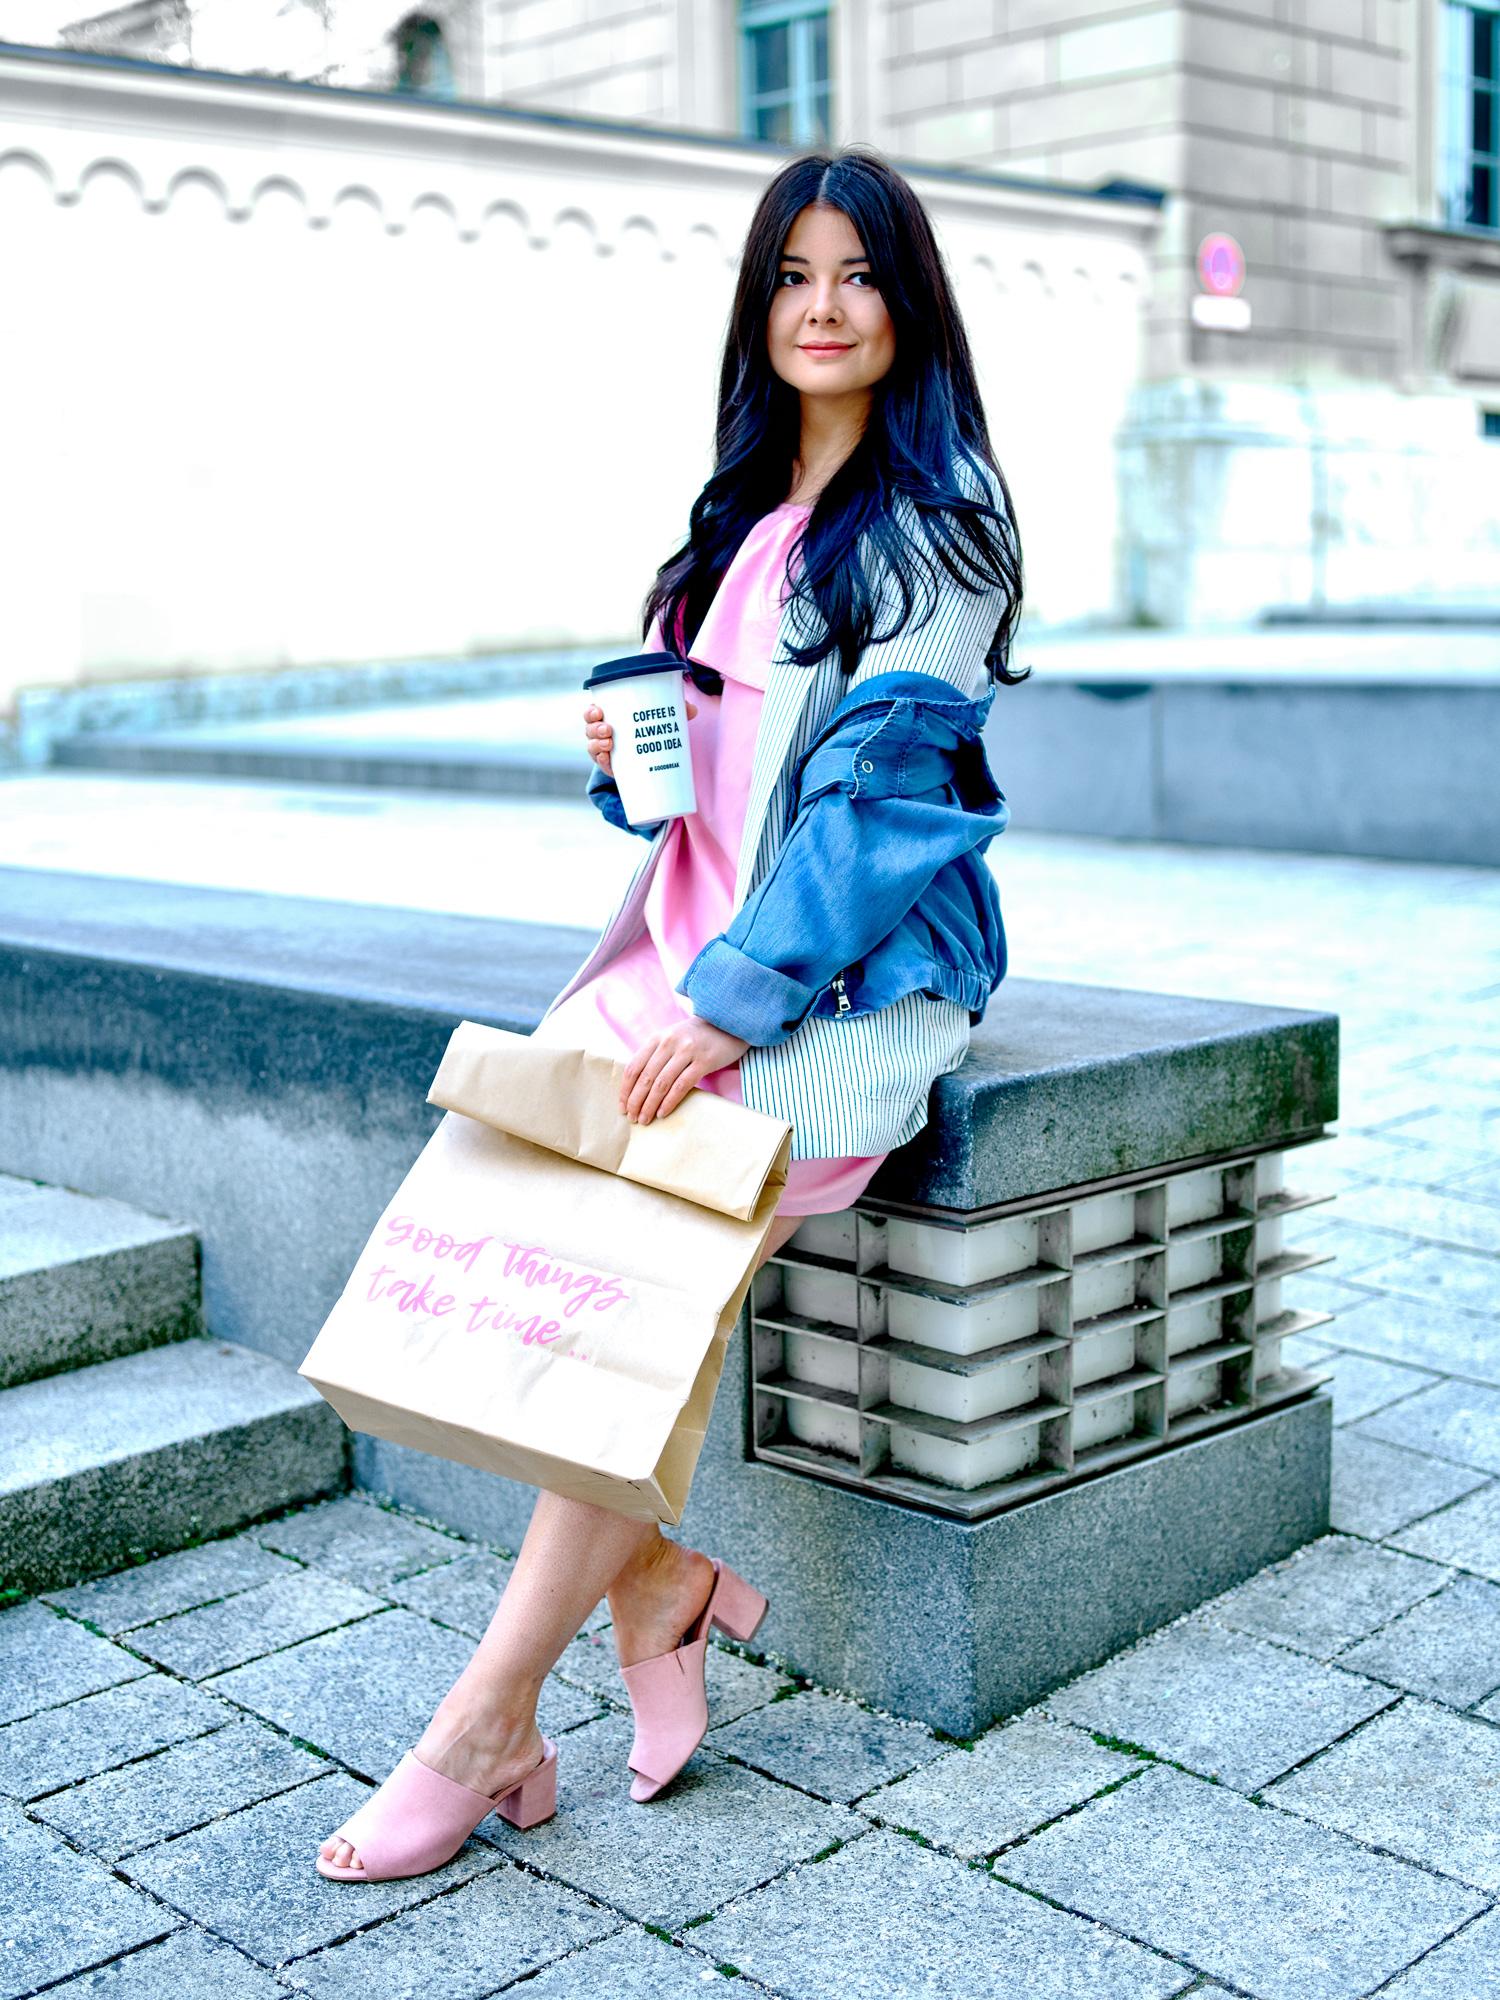 fashionambit-fashionblog-muenchen-modeblog-deutschland-blogger-modeblogger-fashionblogger-bloggerdeutschland-lifestyleblog-munich-style-blog-ostern-outfit